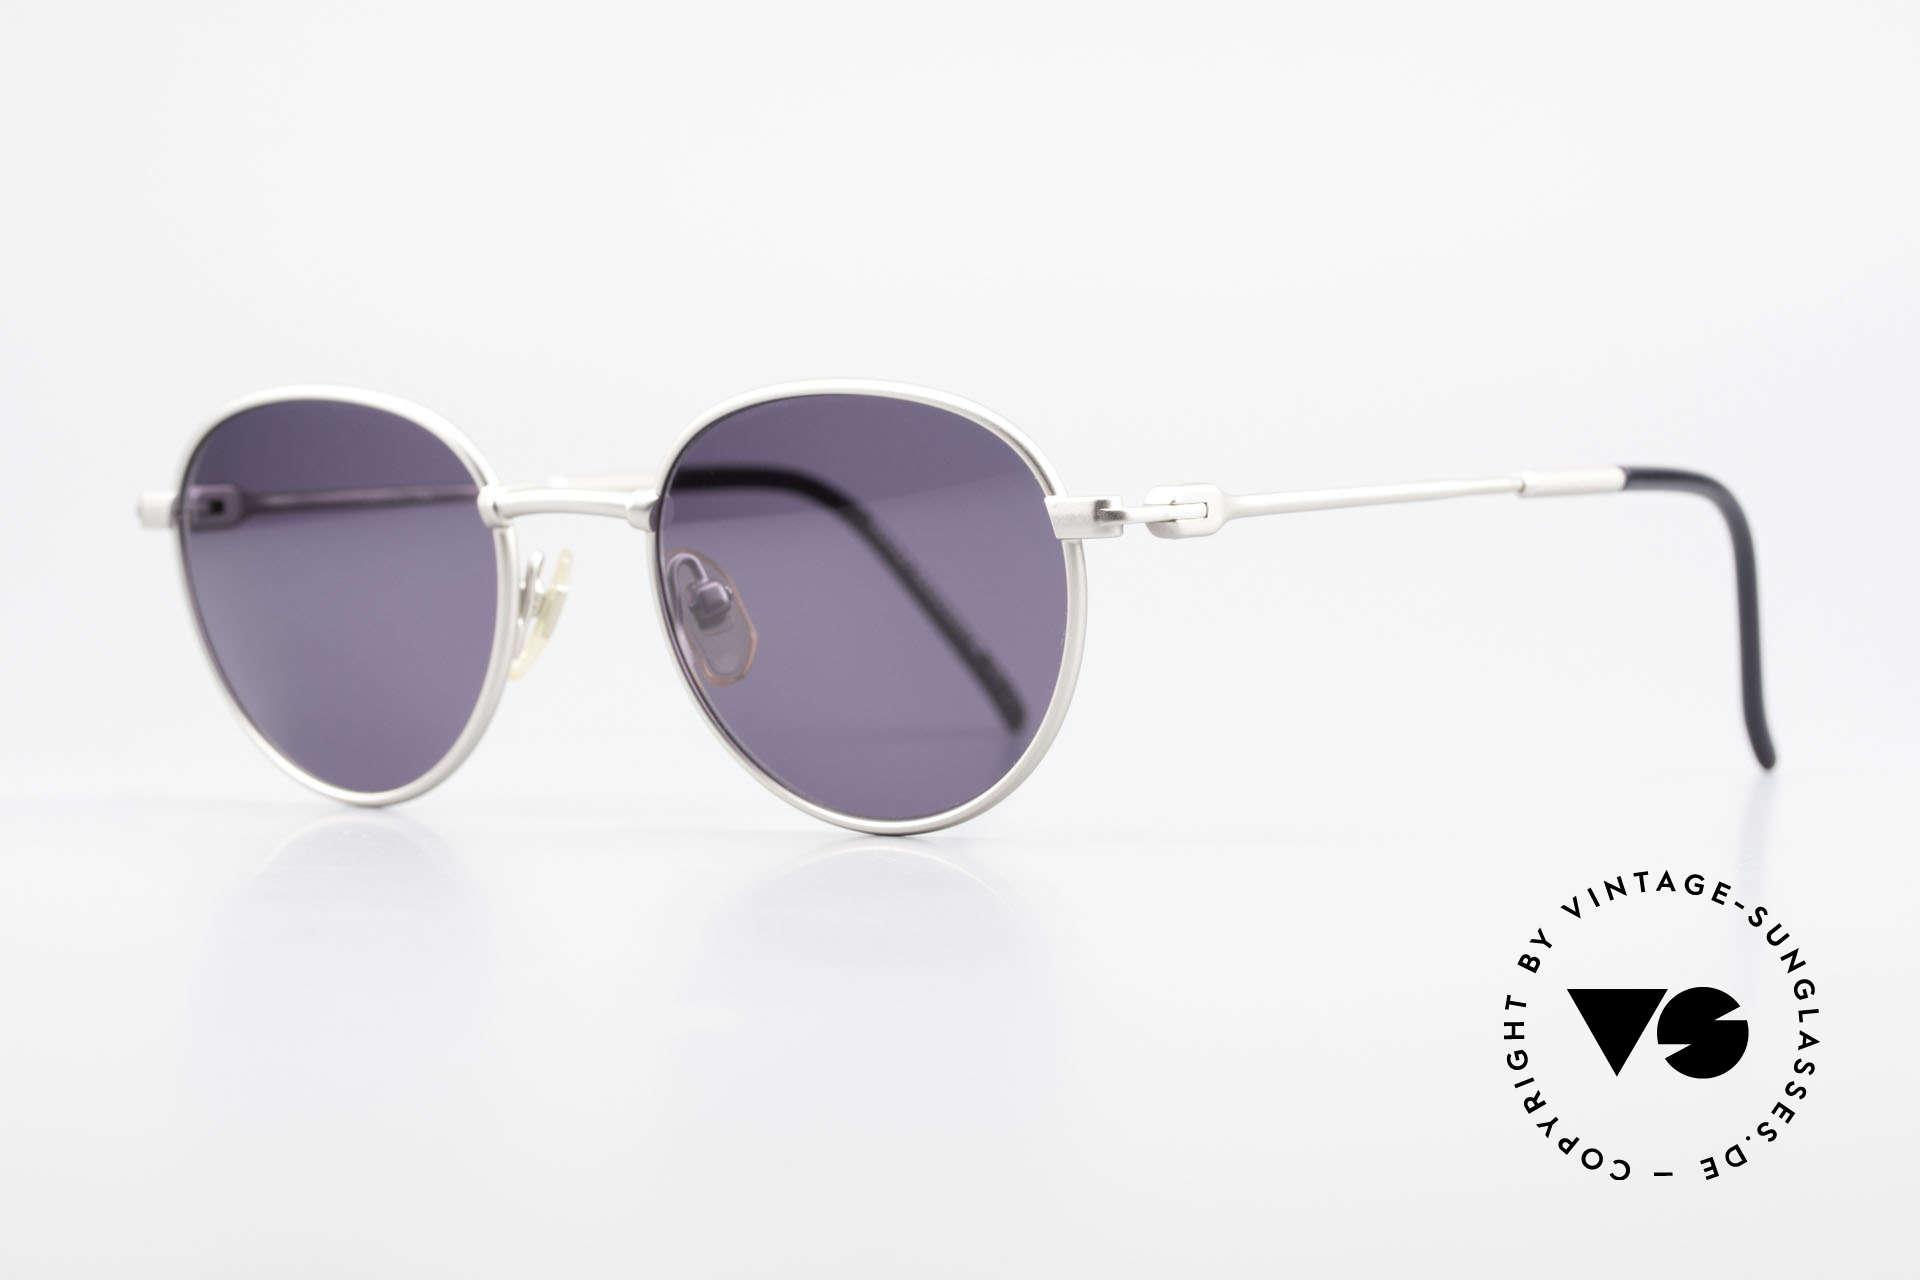 Yohji Yamamoto 52-4102 90's Panto Designer Sunglasses, but world-famous exquisite craftsmanship & materials, Made for Men and Women